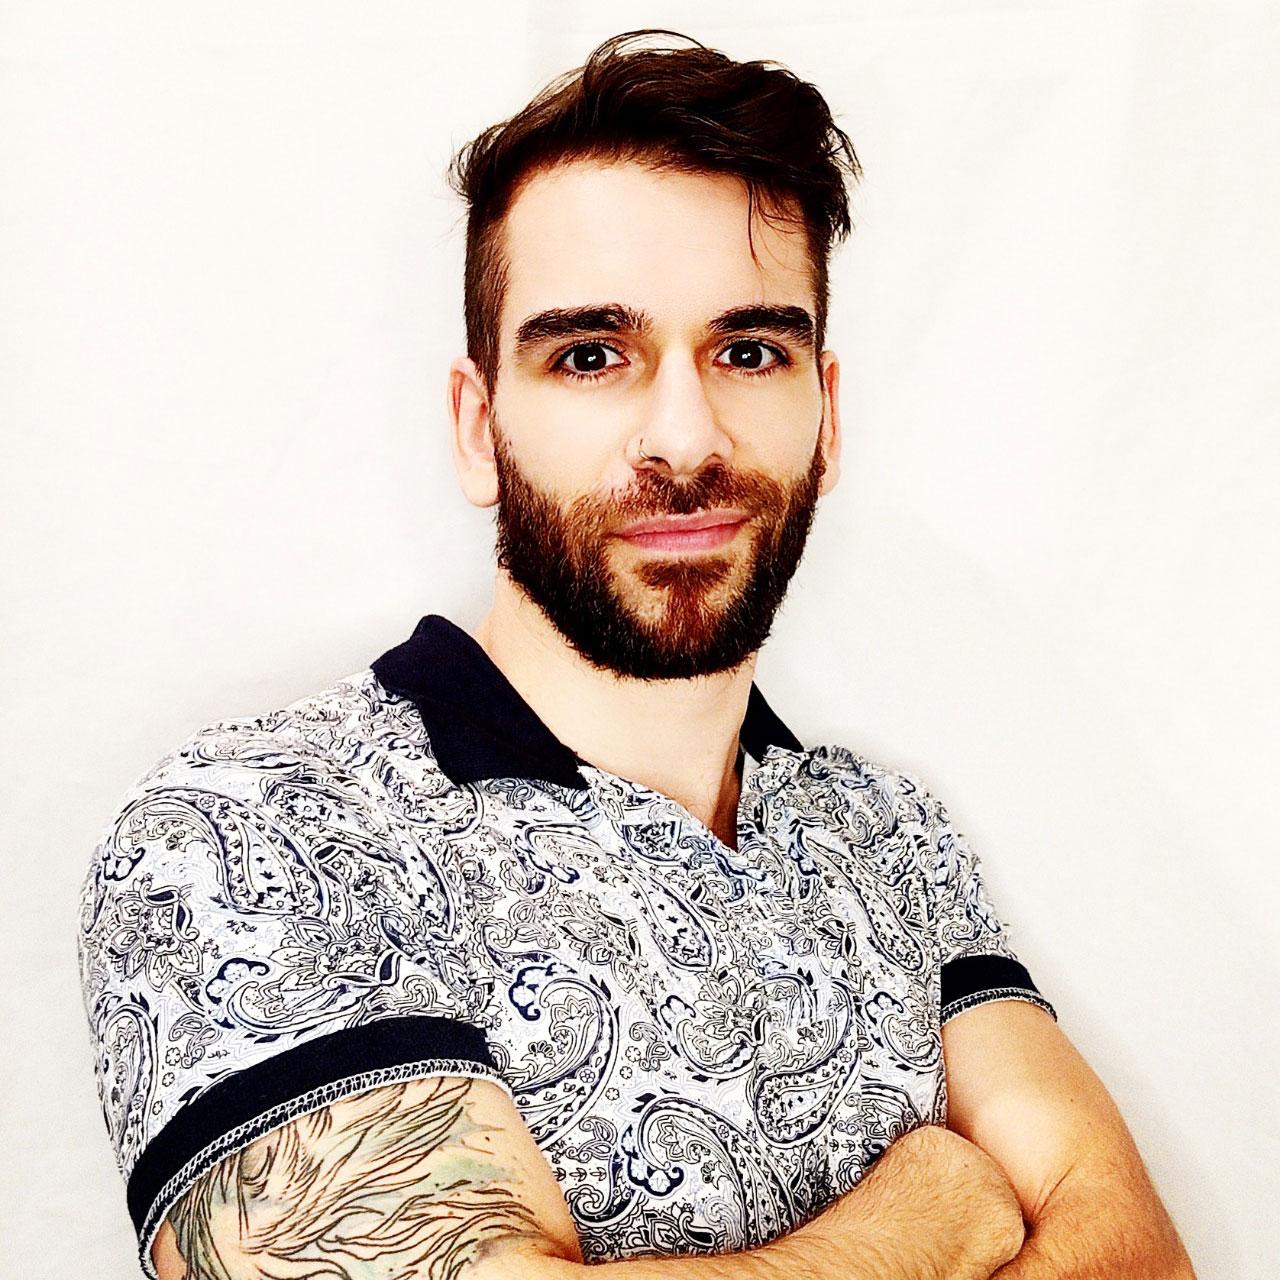 Manuel-David